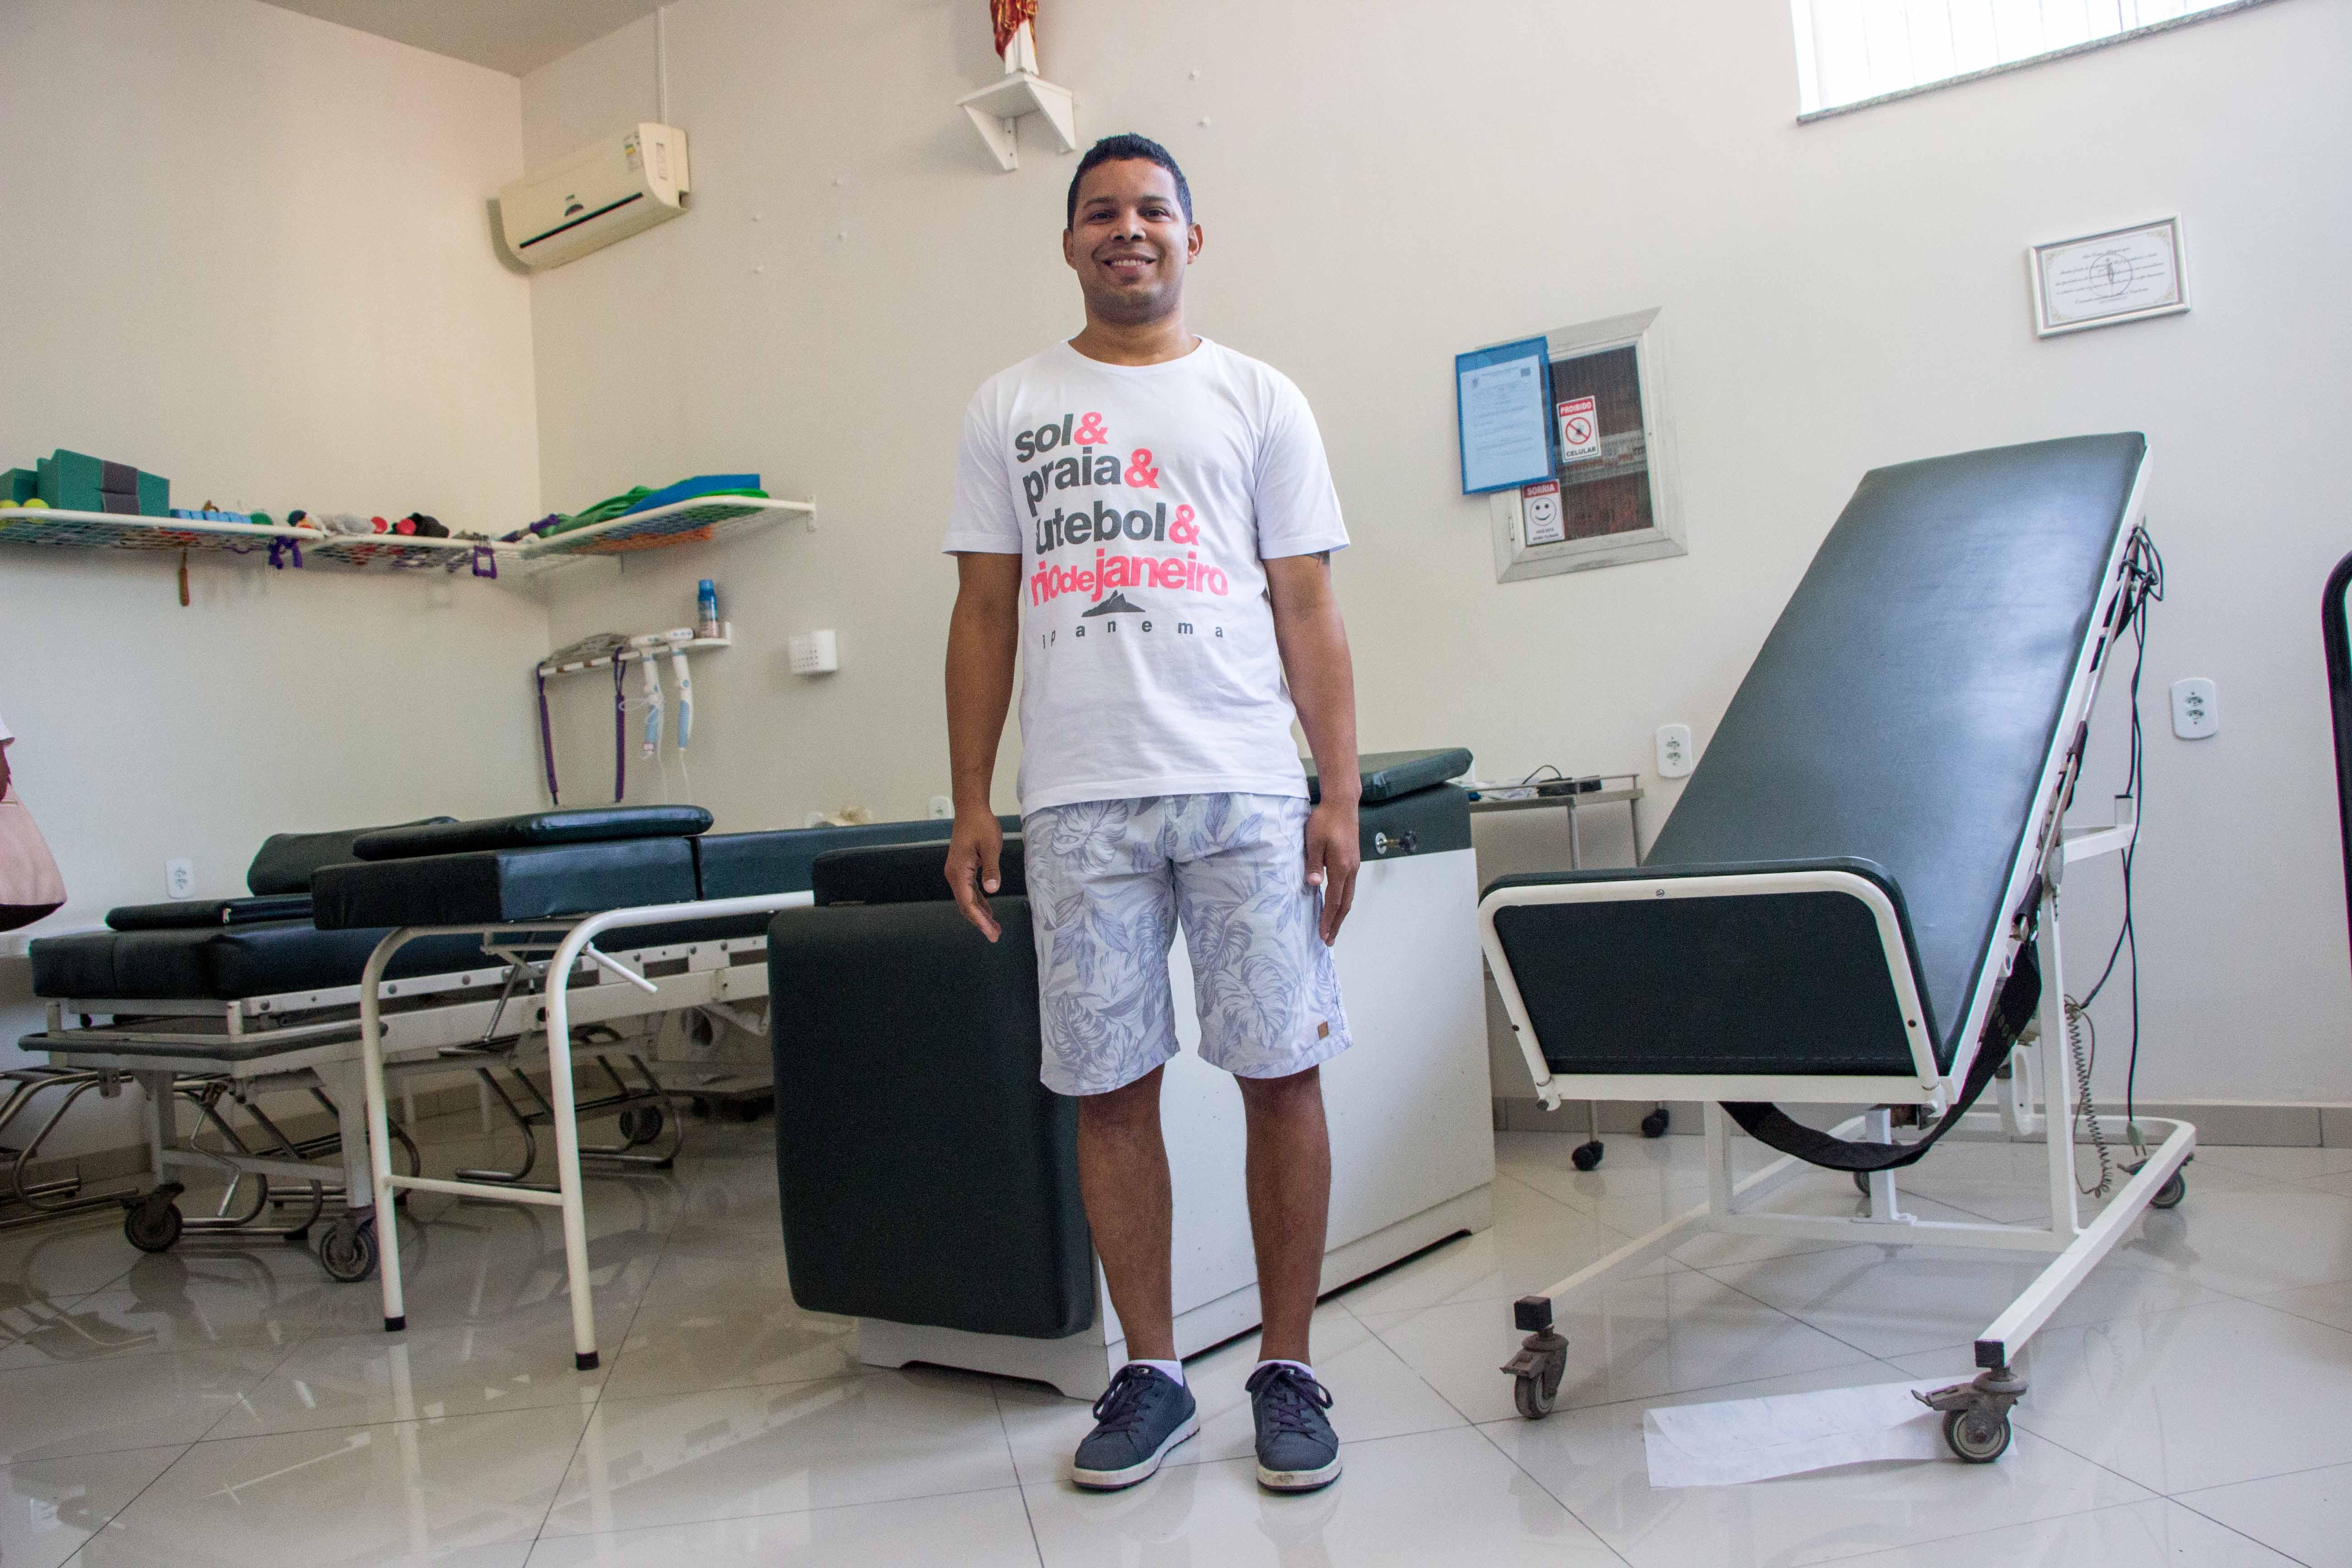 Instituto oferece atendimento gratuito de fisioterapia para moradores